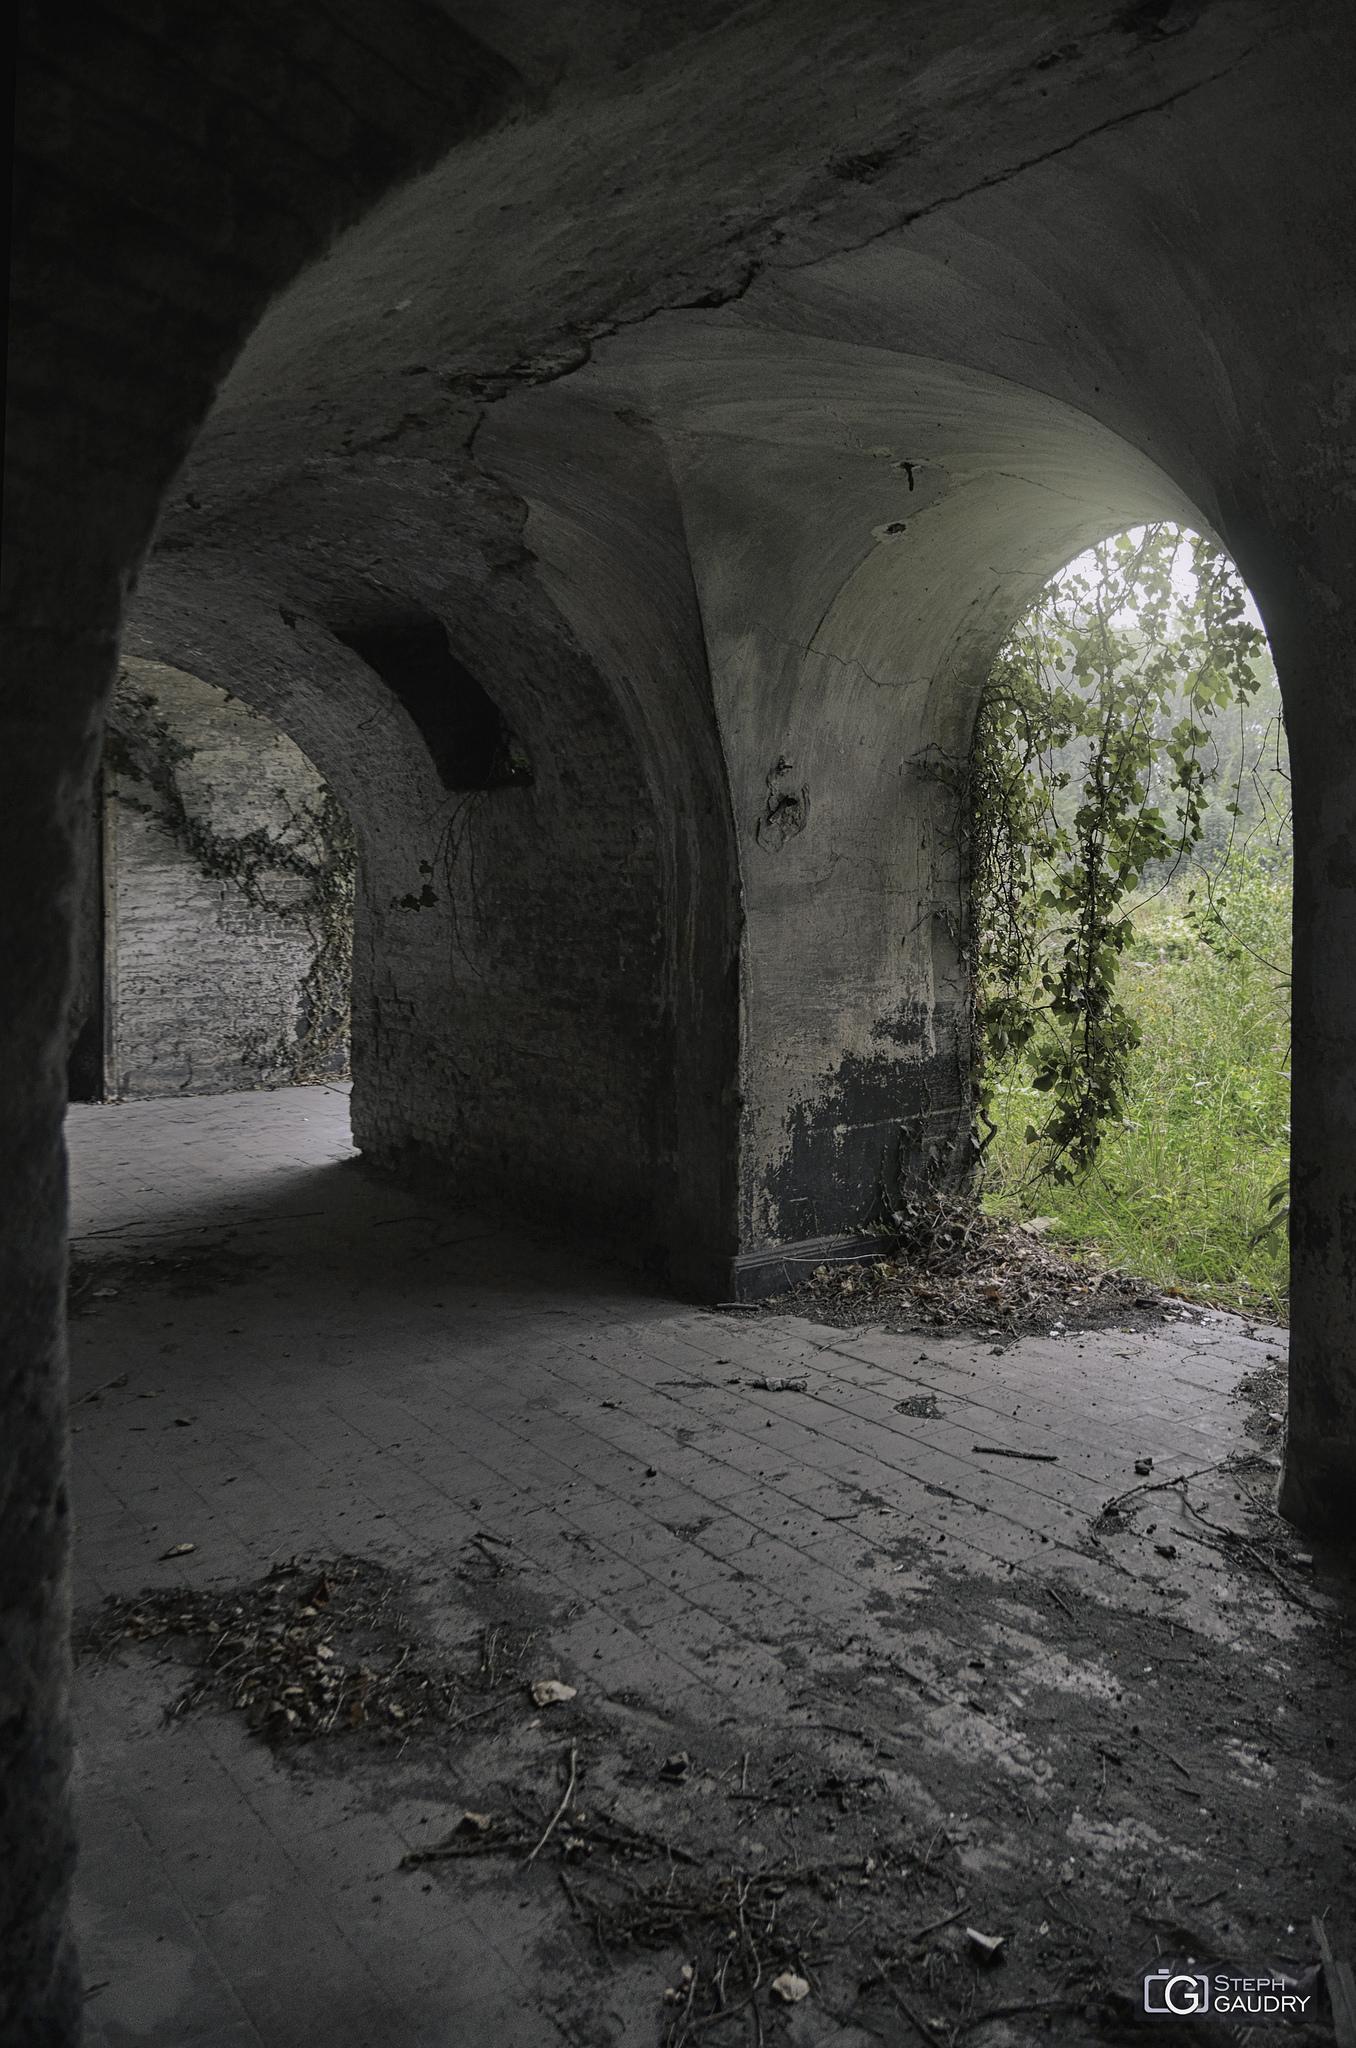 Like a cloister or a crypt [Cliquez pour lancer le diaporama]